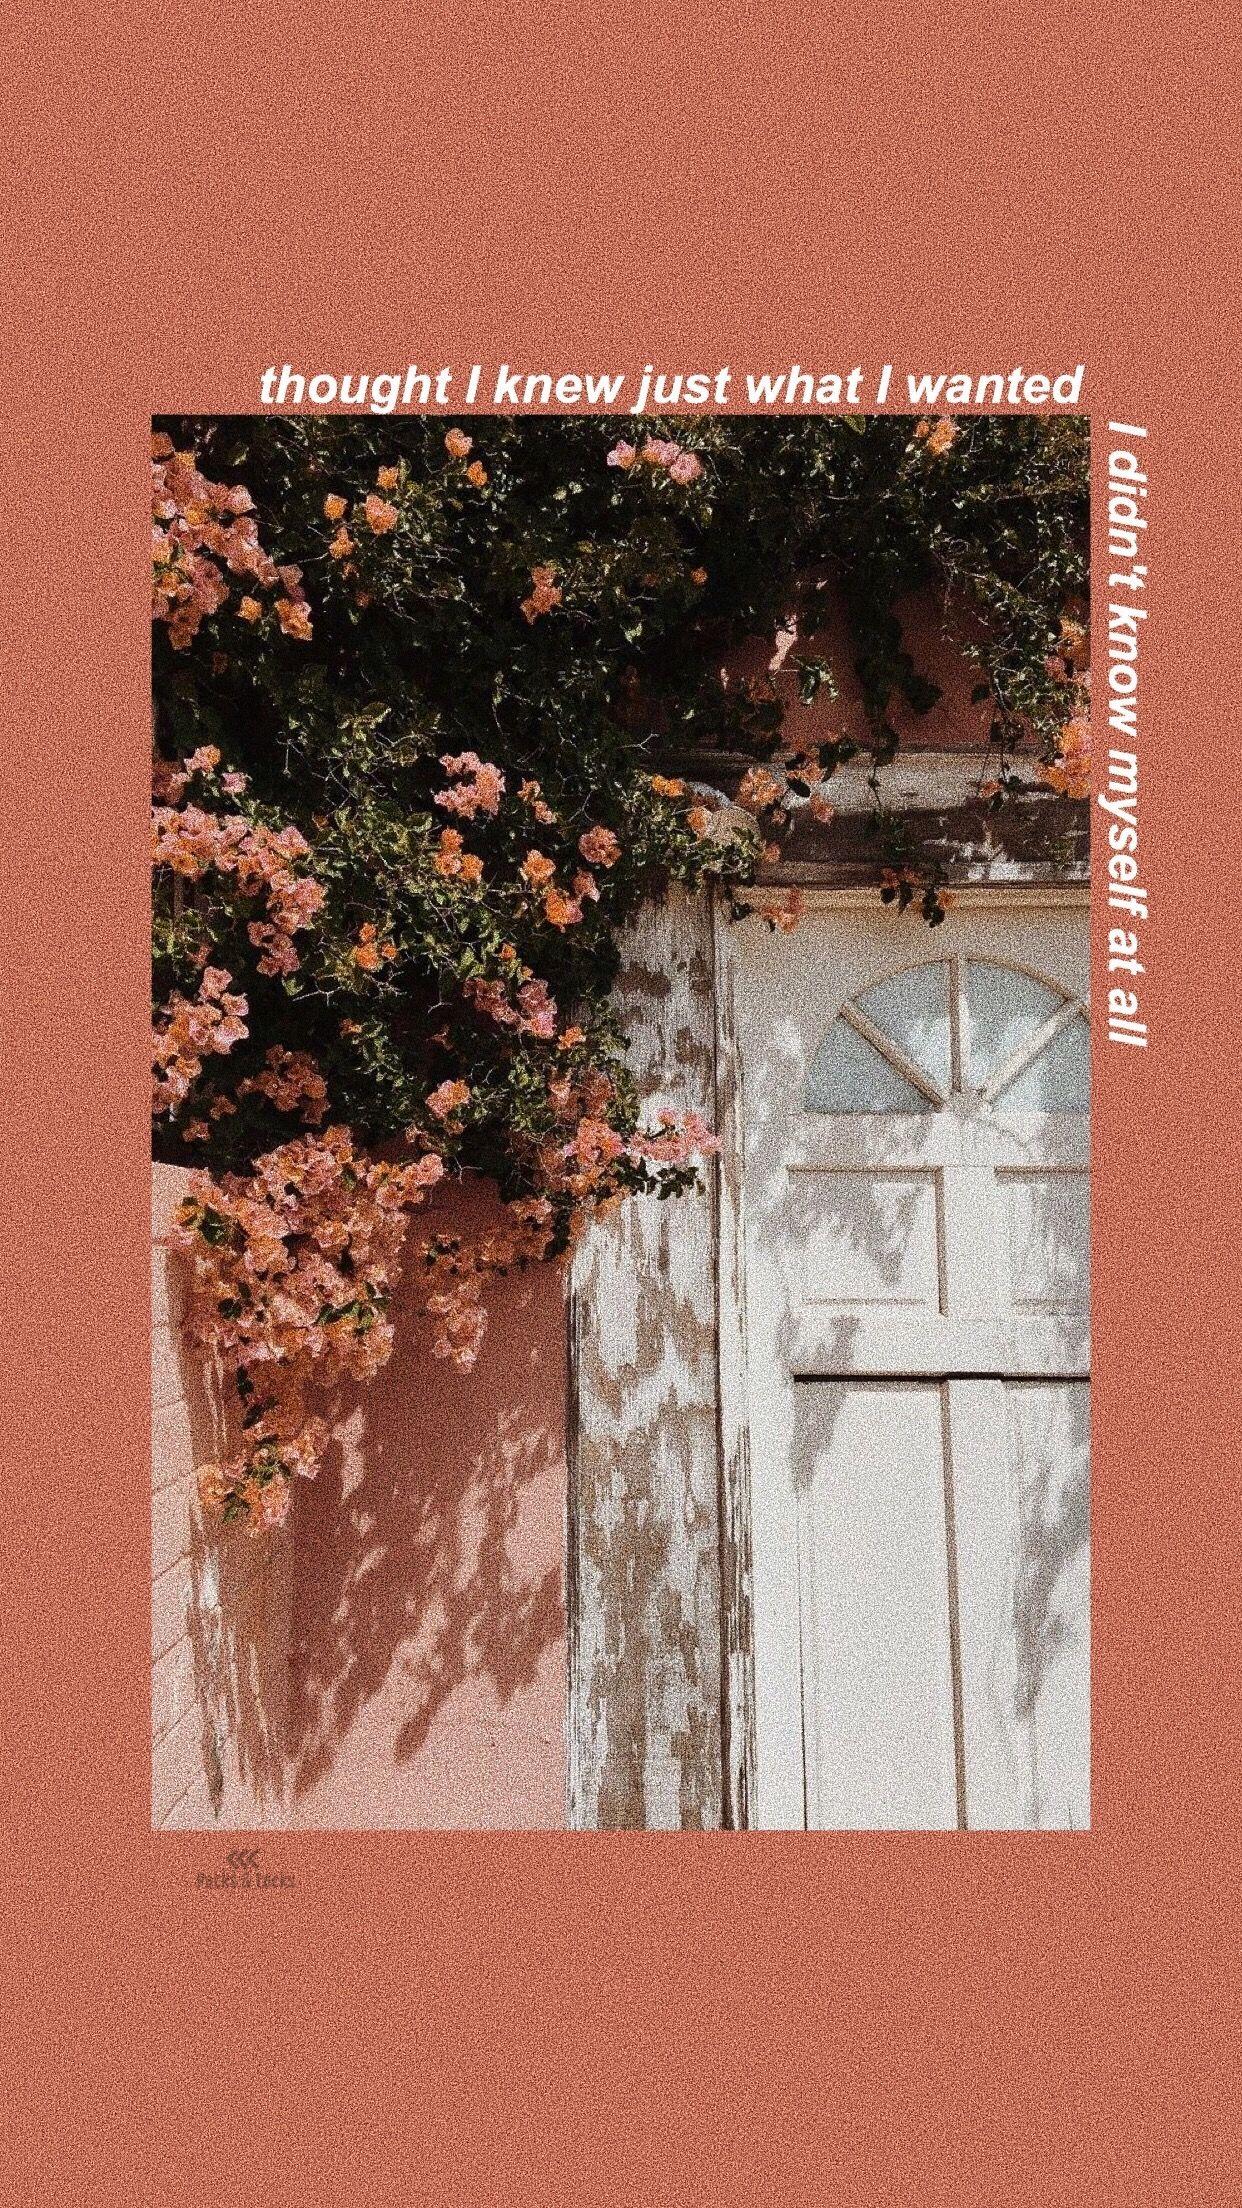 Shawn Mendes Lyrics Wallpaper Because I Had You 壁紙 イラスト